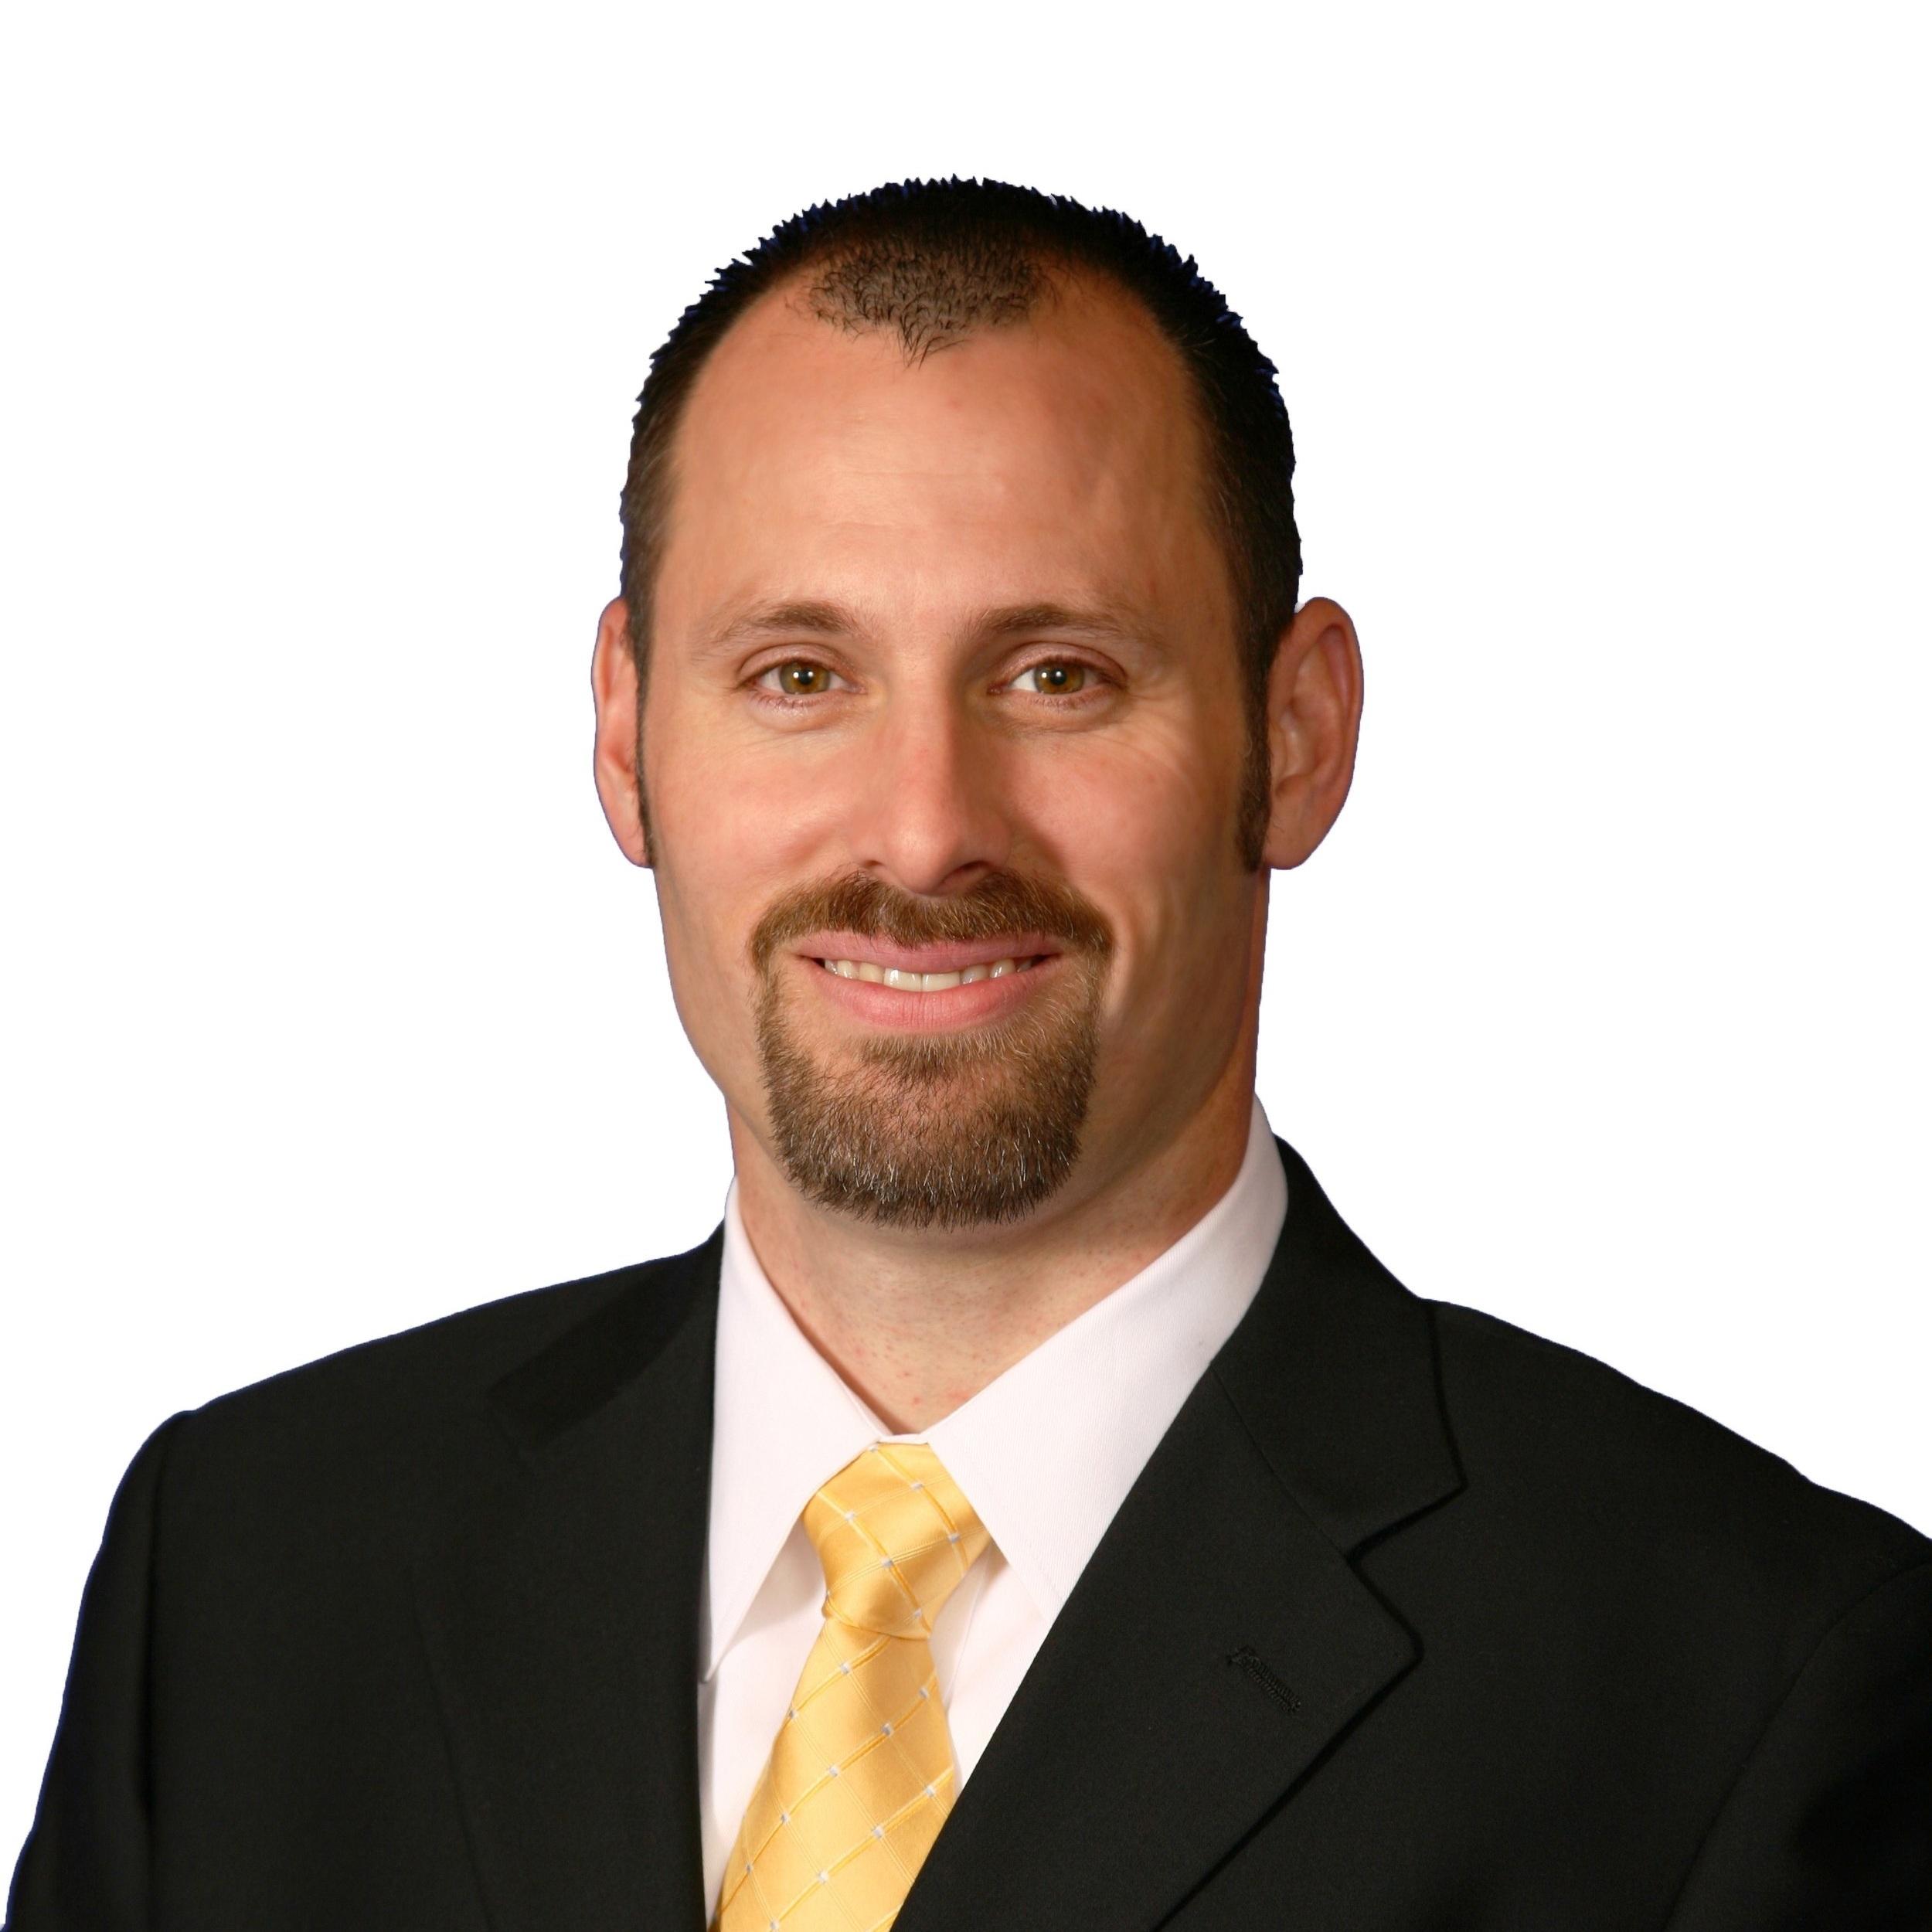 SHANE THOMPSON - ASSET VU real estate brokeragepresident / broker(916) 223-8119shane@assetvu.comDRE #01803537